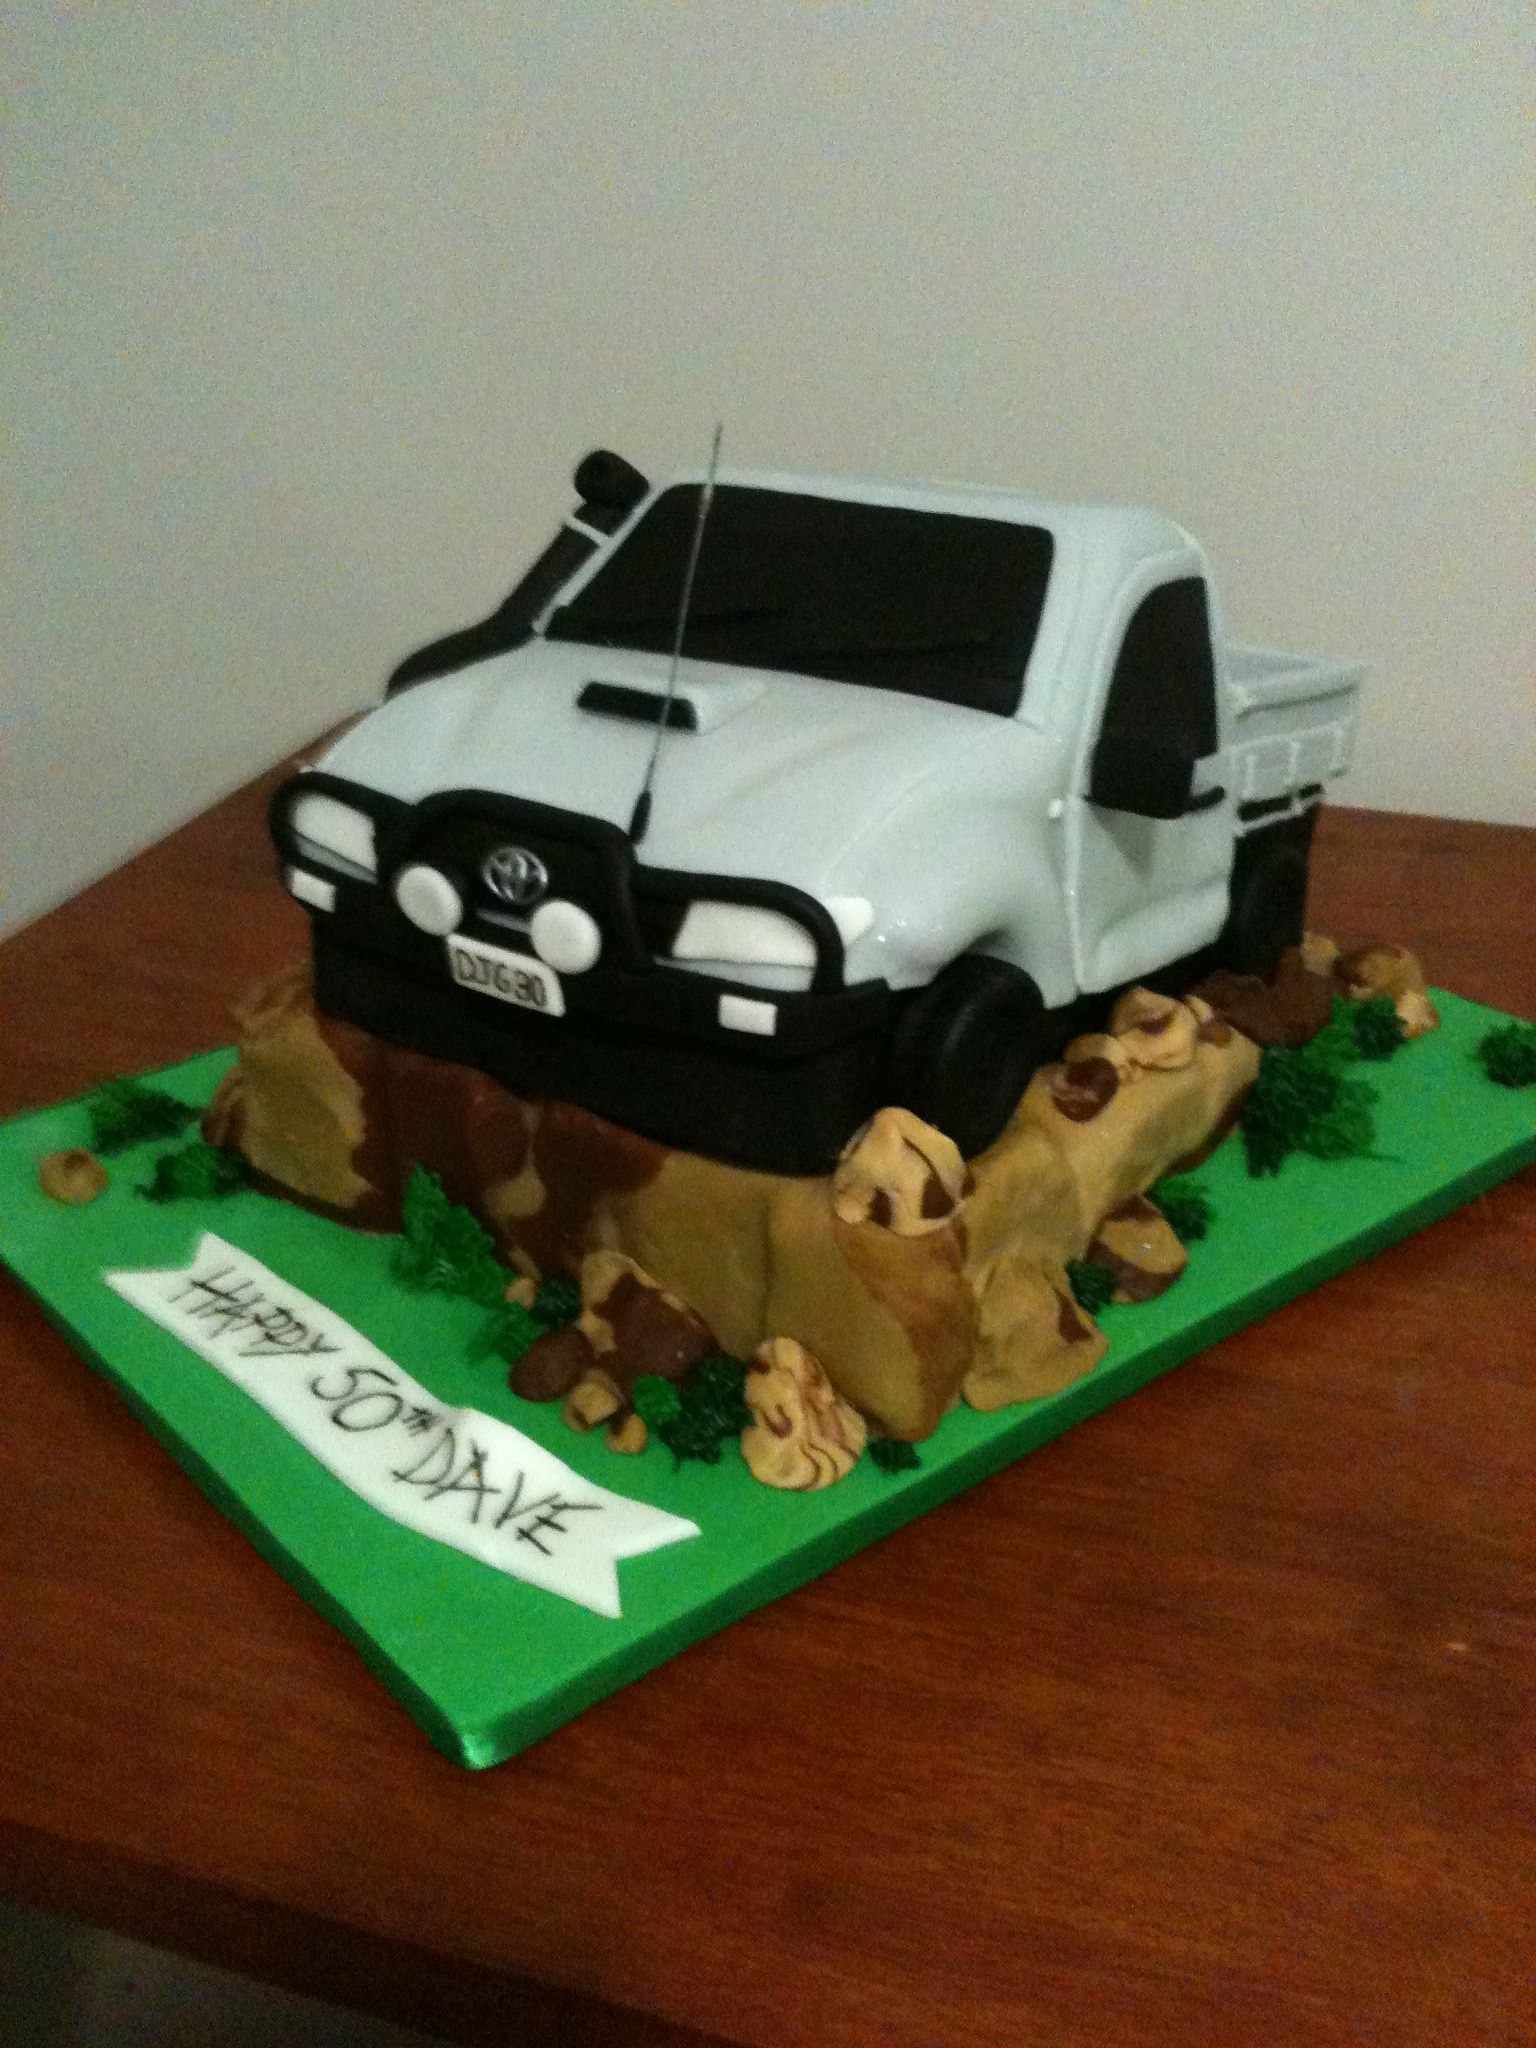 R35 Gtr Light Up Cake Tevashan T Cake Motorcycle Cake